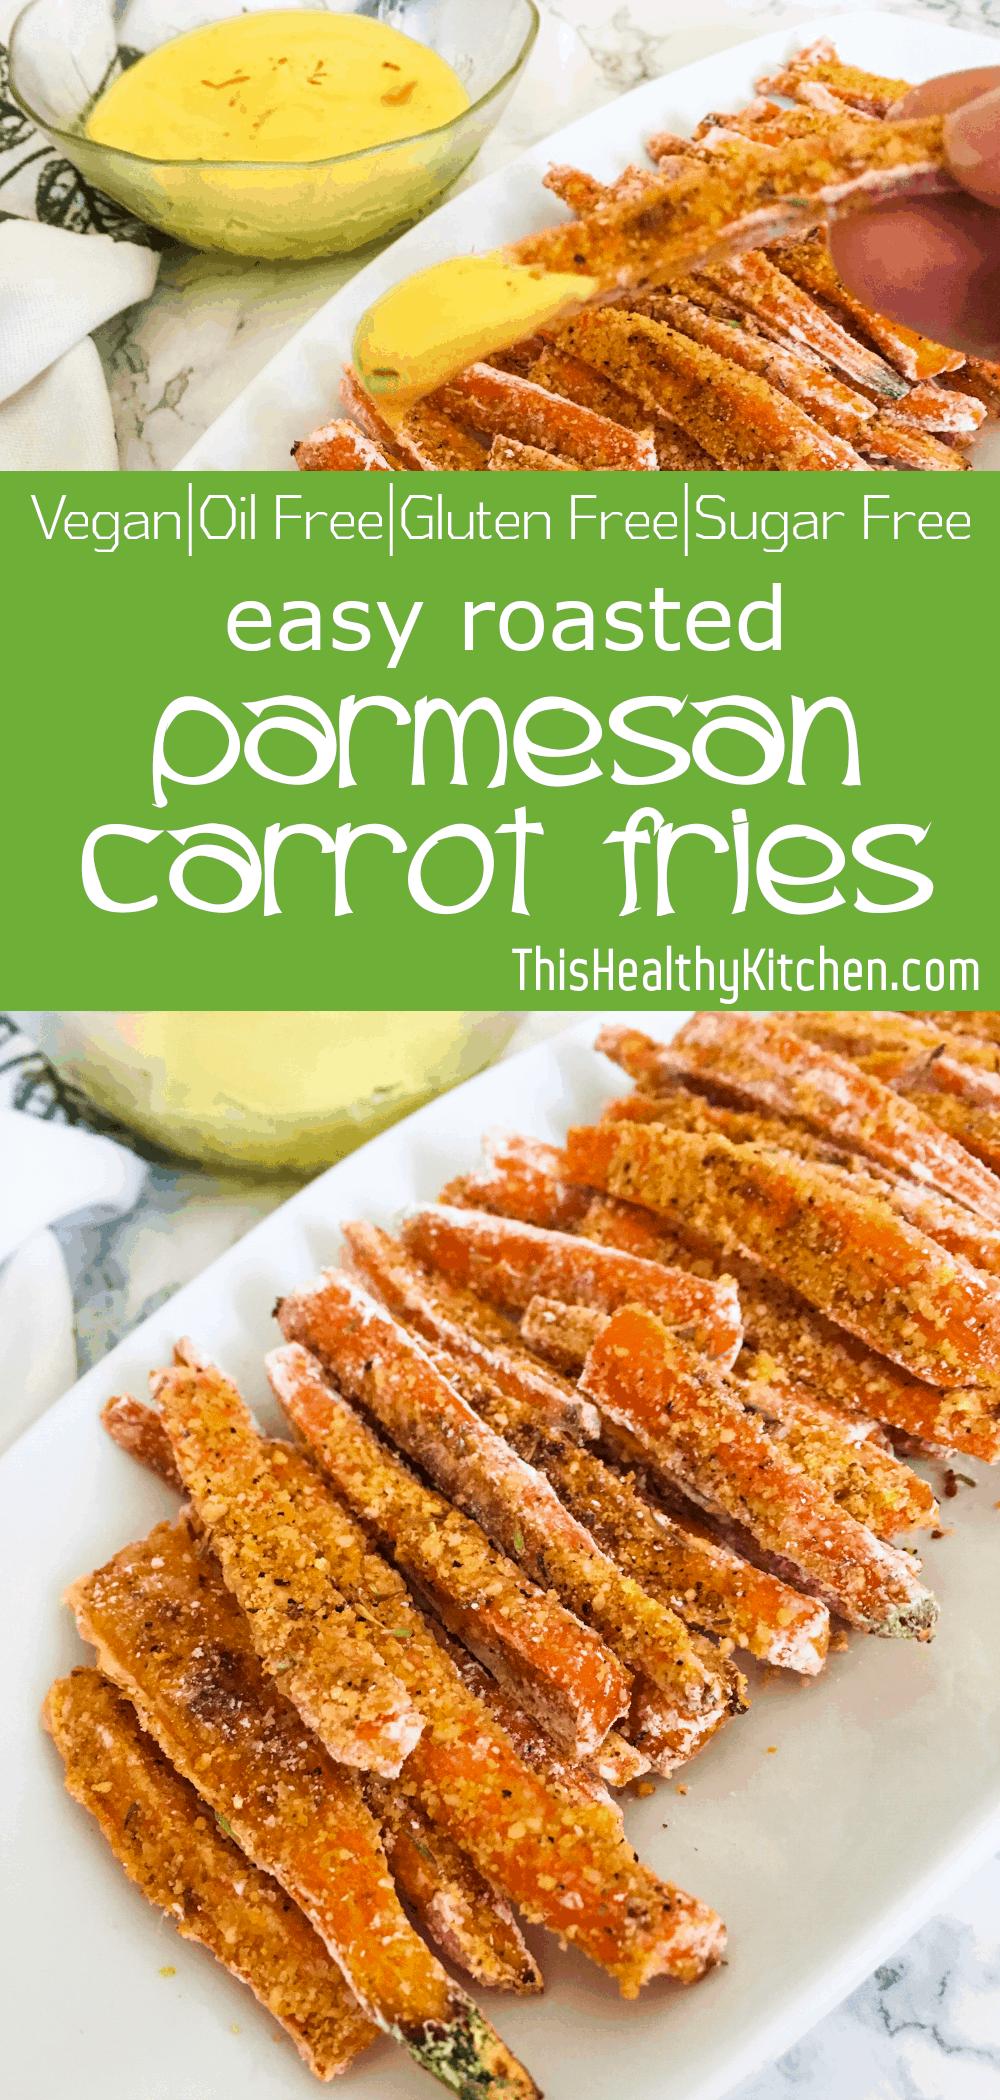 parmesan carrot fries pin